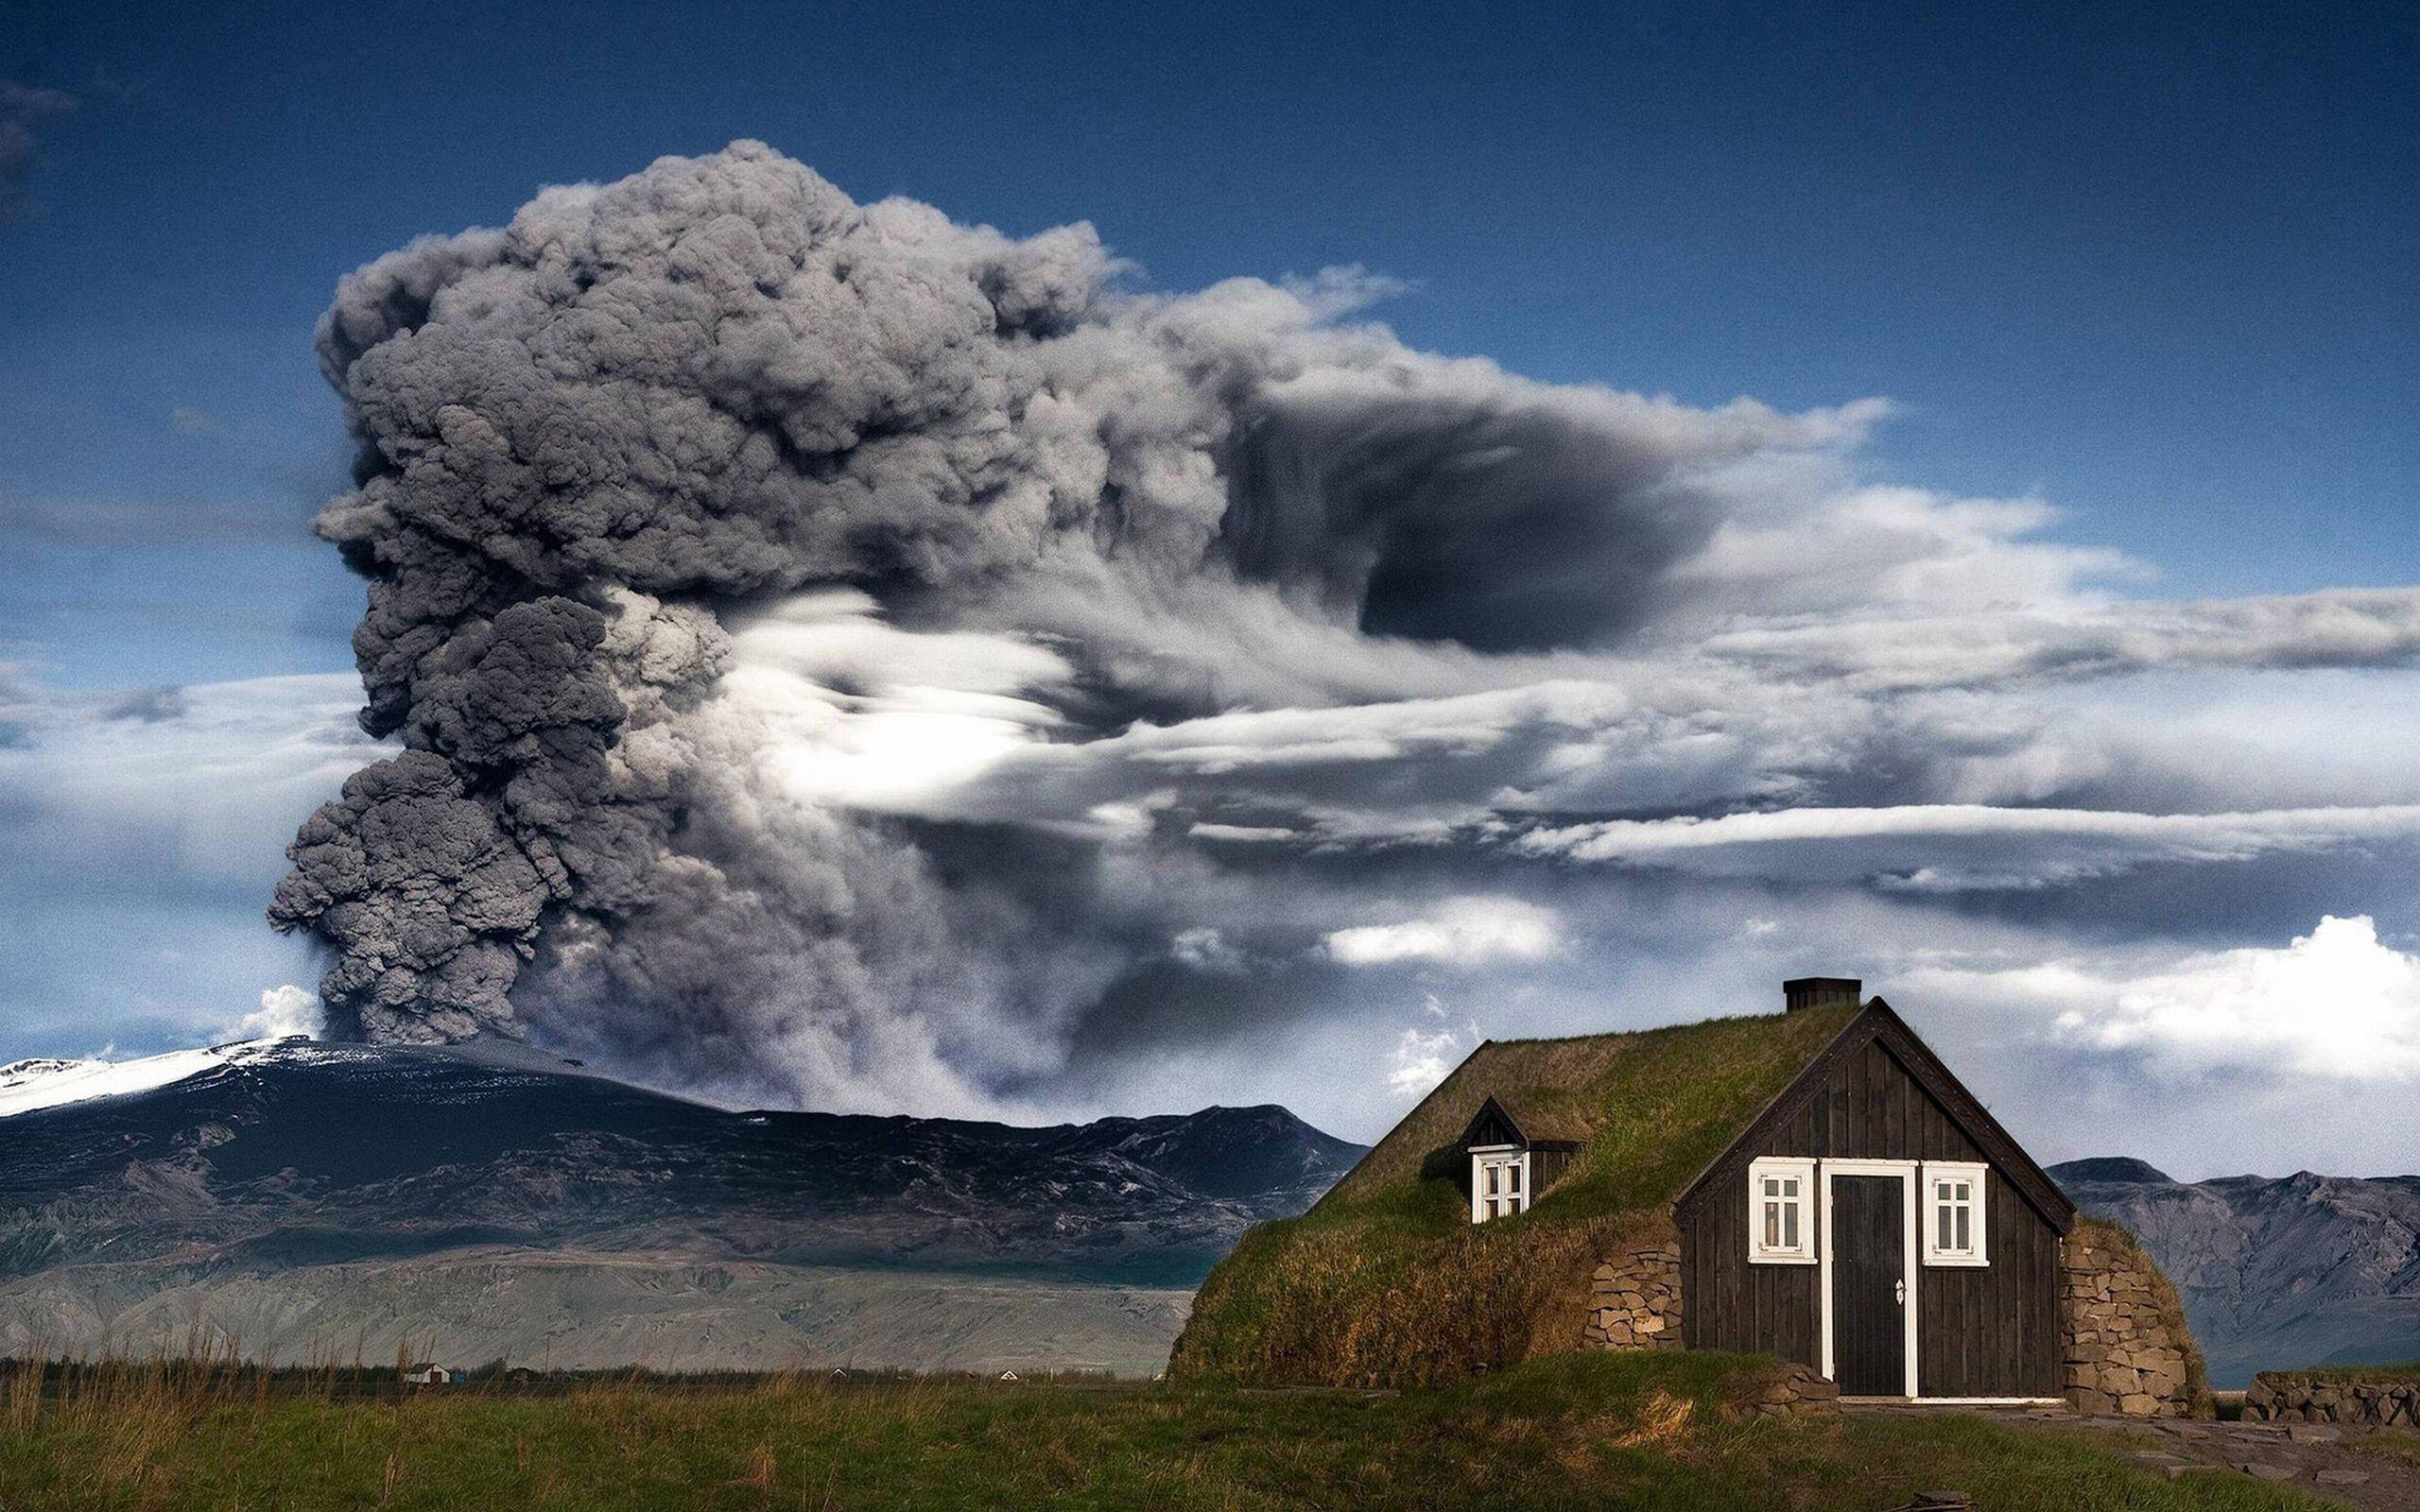 General 2560x1600 Iceland eruption mountains volcano nordic landscapes volcanic eruption cabin sky nature outdoors landscape